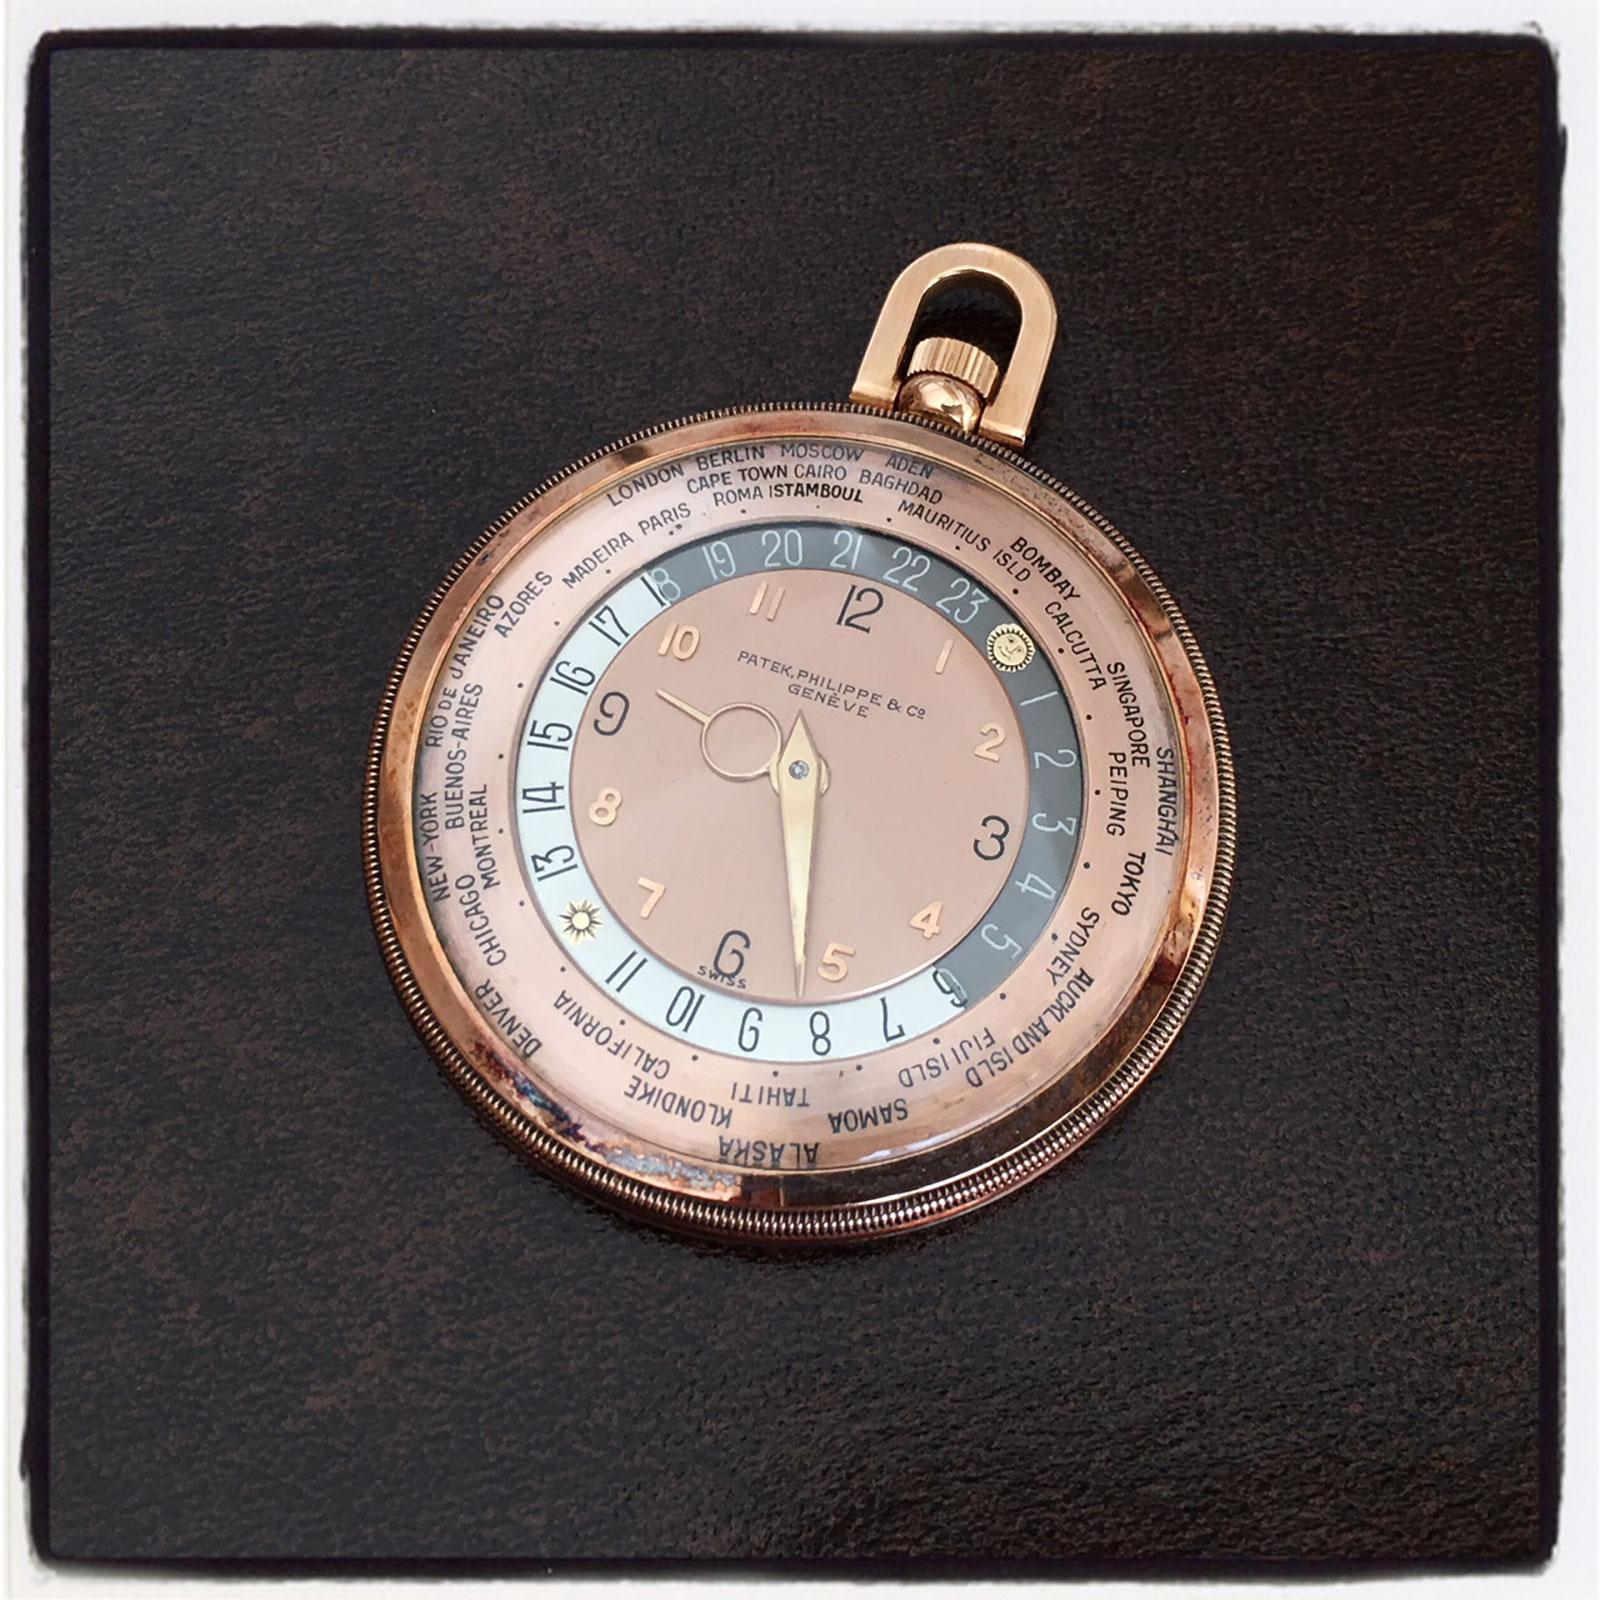 Patek Philippe world time pocket watch 605HU pink